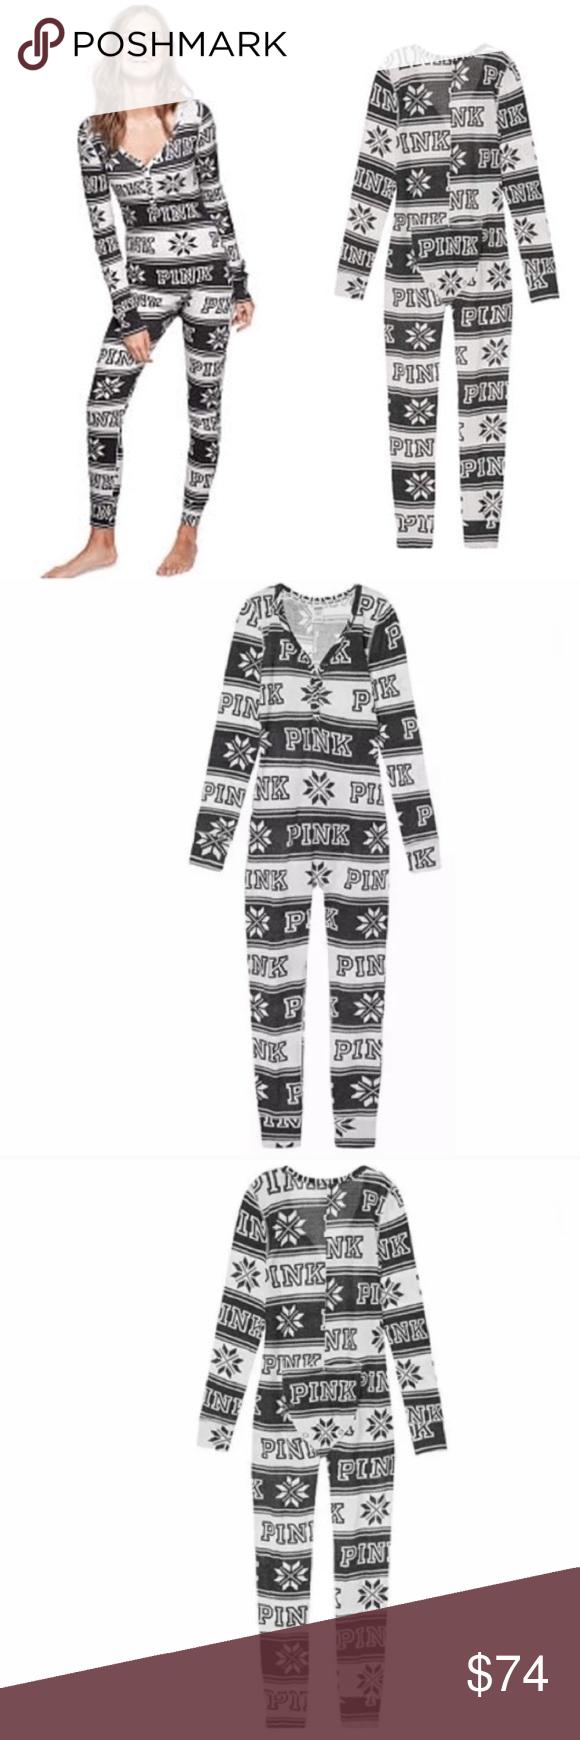 f4de4262bea3c Vs Pink Cozy Holiday Onesie Pajama Thermal Sleep S Vs Victorias ...